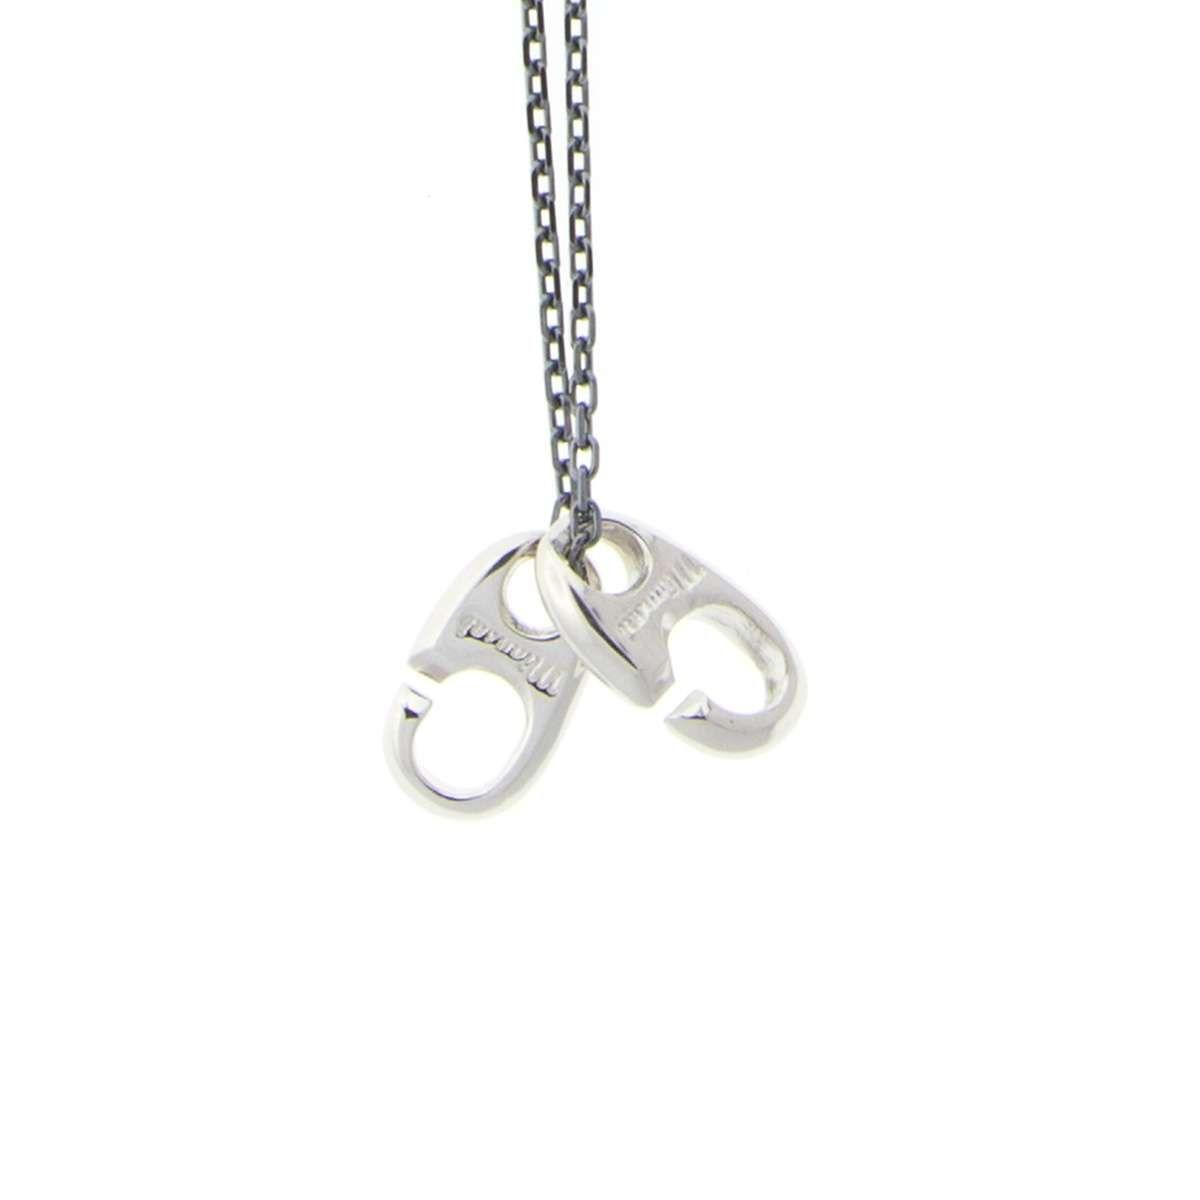 Mini-Brummel Necklace Sterling - Necklaces